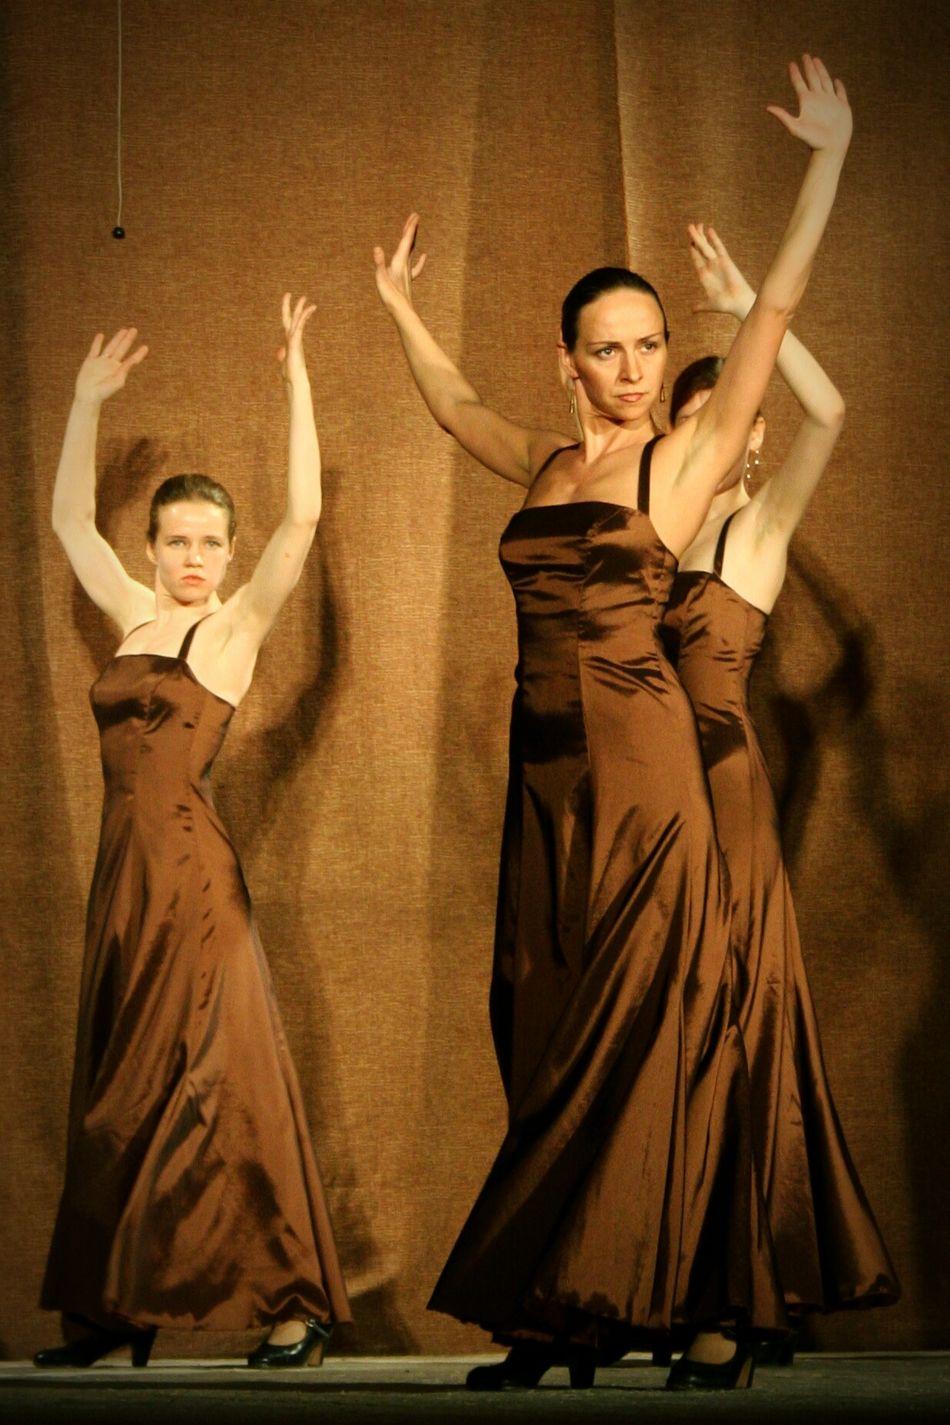 Flamenco Flamenco_dancers Flamencoderusia Flamenco_en_Rusia фламенко фламенко_в_Москве фламенко_в_России танец Flamenco_de_moscú Flamencodemoscu Baile Baile Flamenco Bailando Siguiriya Seguiriya La_Compañía Compañía_de_Danza_Española